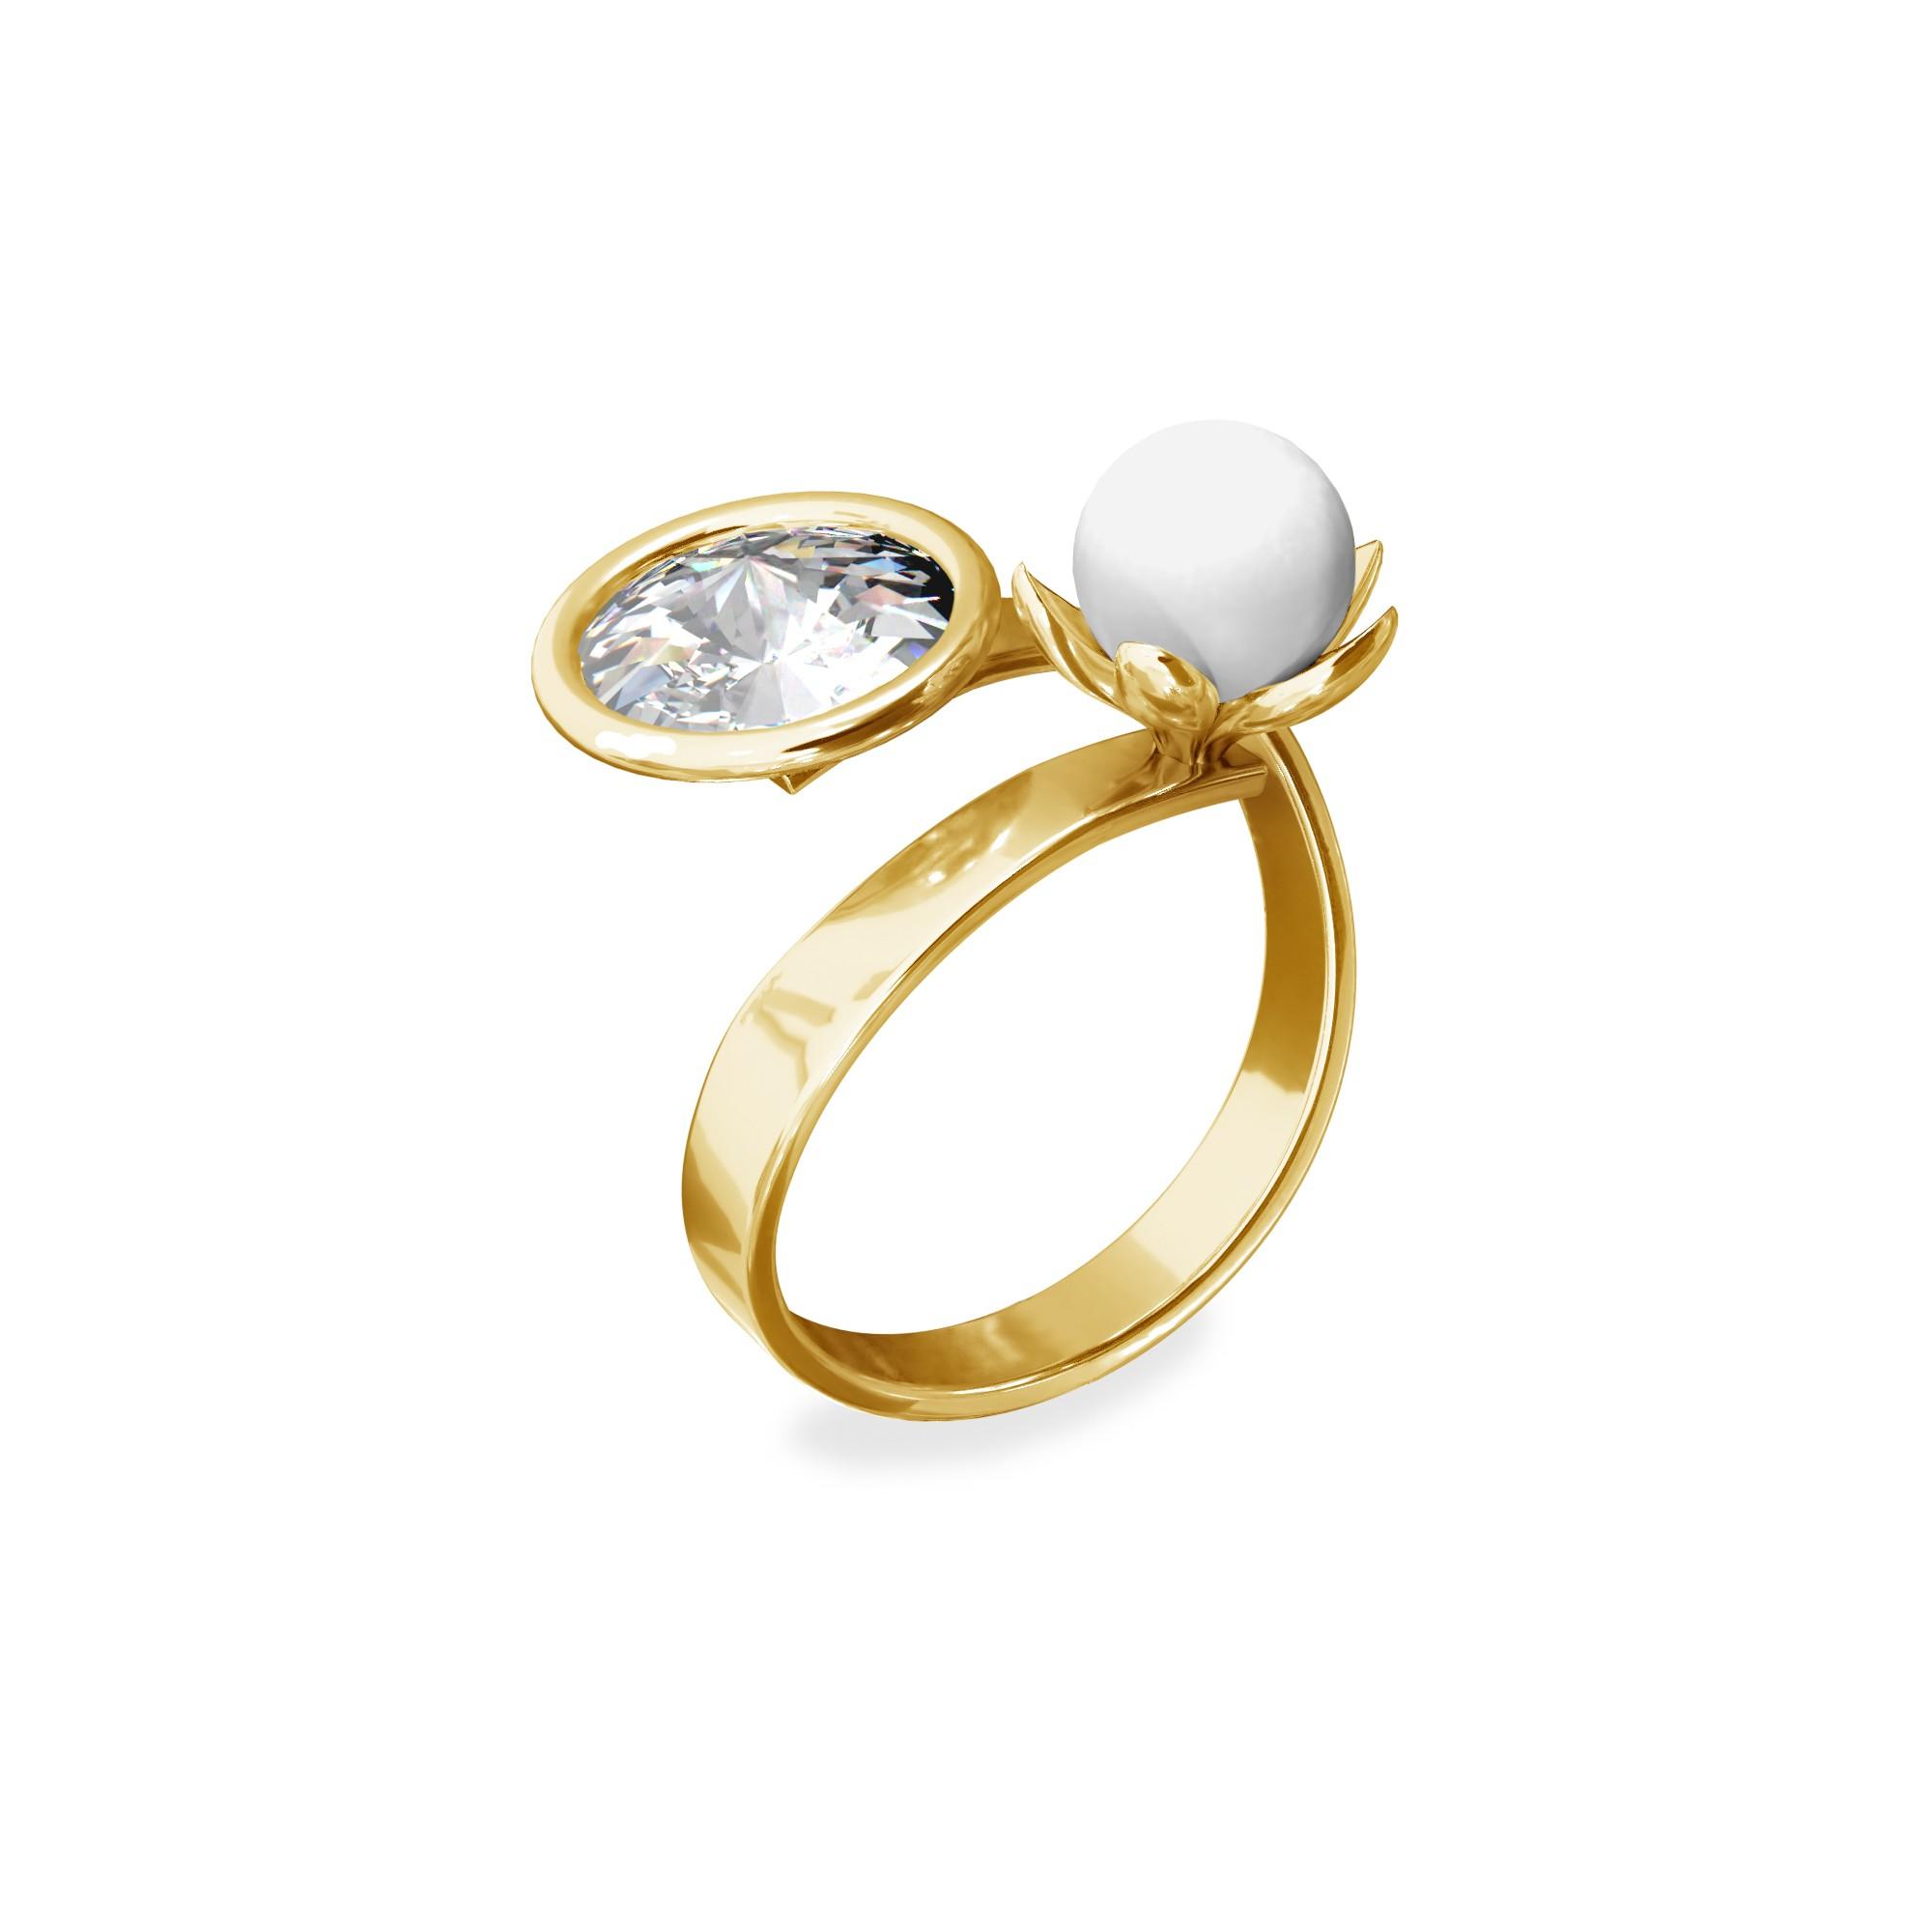 Ring with Swarvoski crystal & pearl, sterling silver 925